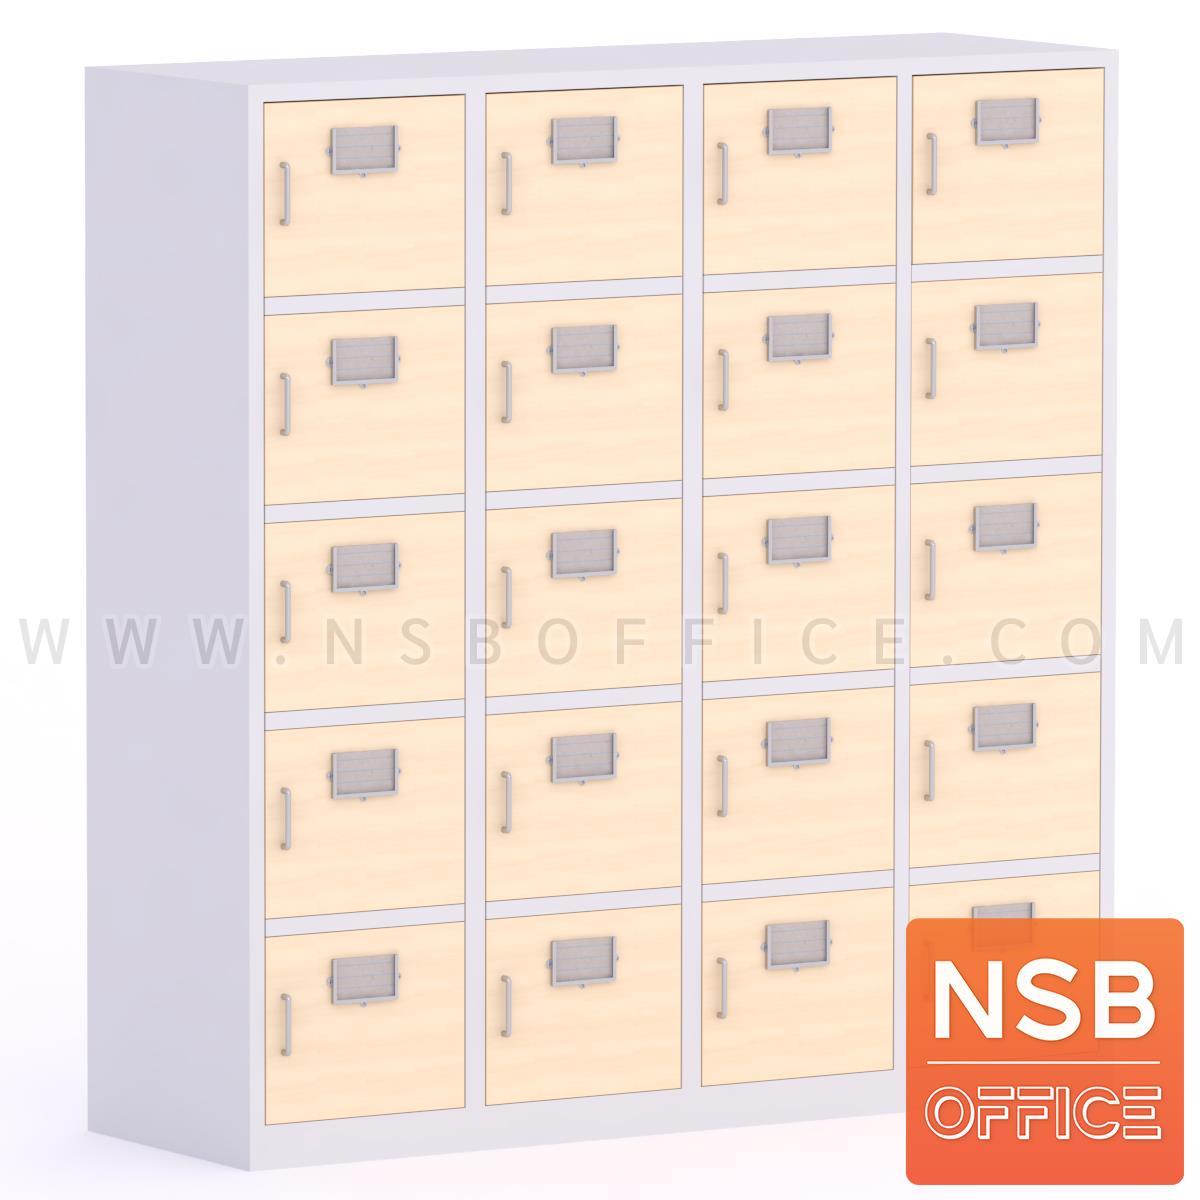 C13A010:ตู้ล็อคเกอร์ไม้ 20 ประตู รุ่น DARIN (ดาริน) ขนาด 115W*120H cm. เมลามีน